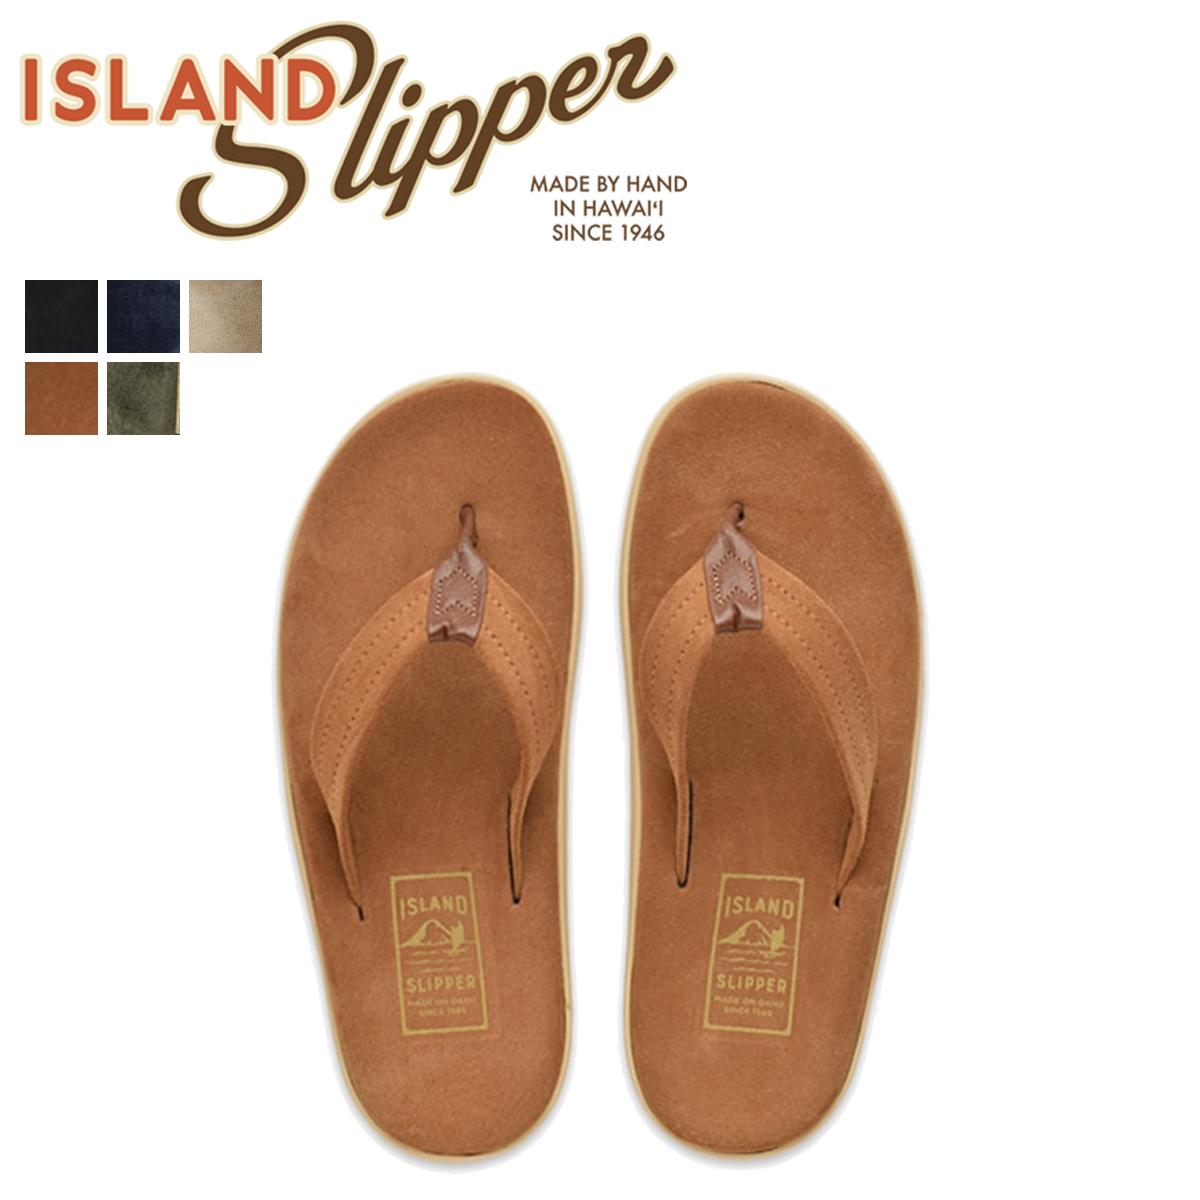 ISLAND SLIPPER アイランドスリッパ サンダル トングサンダル メンズ スエード ULTIMATE SUEDE PT203SL [4/5 追加入荷]